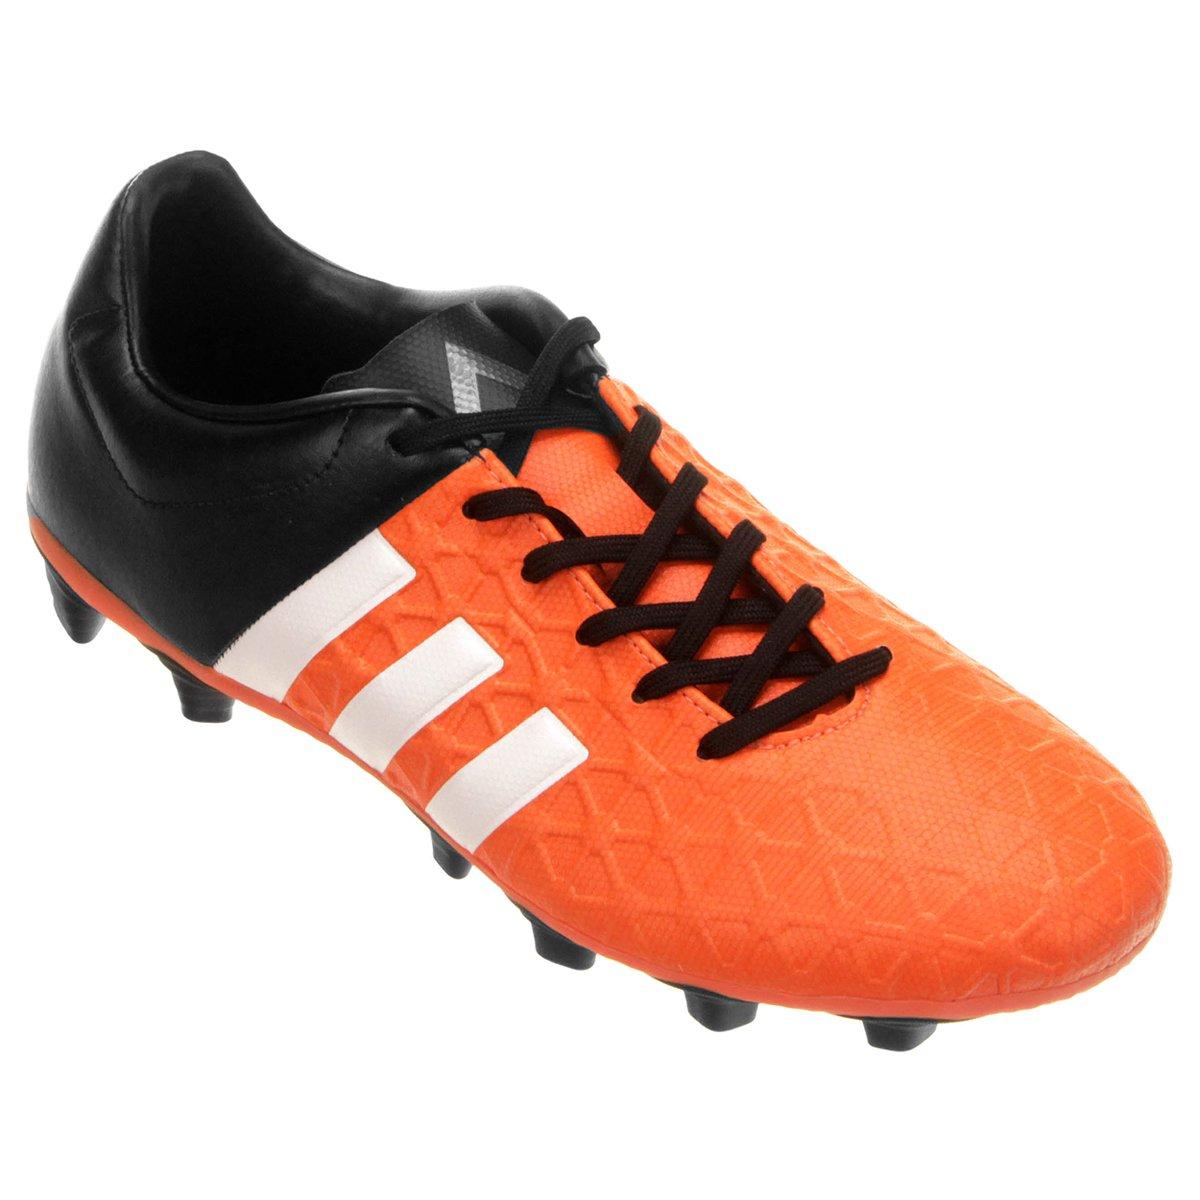 ccb3f8a5fe244 ... Chuteira Adidas Ace 15.4 FG Campo